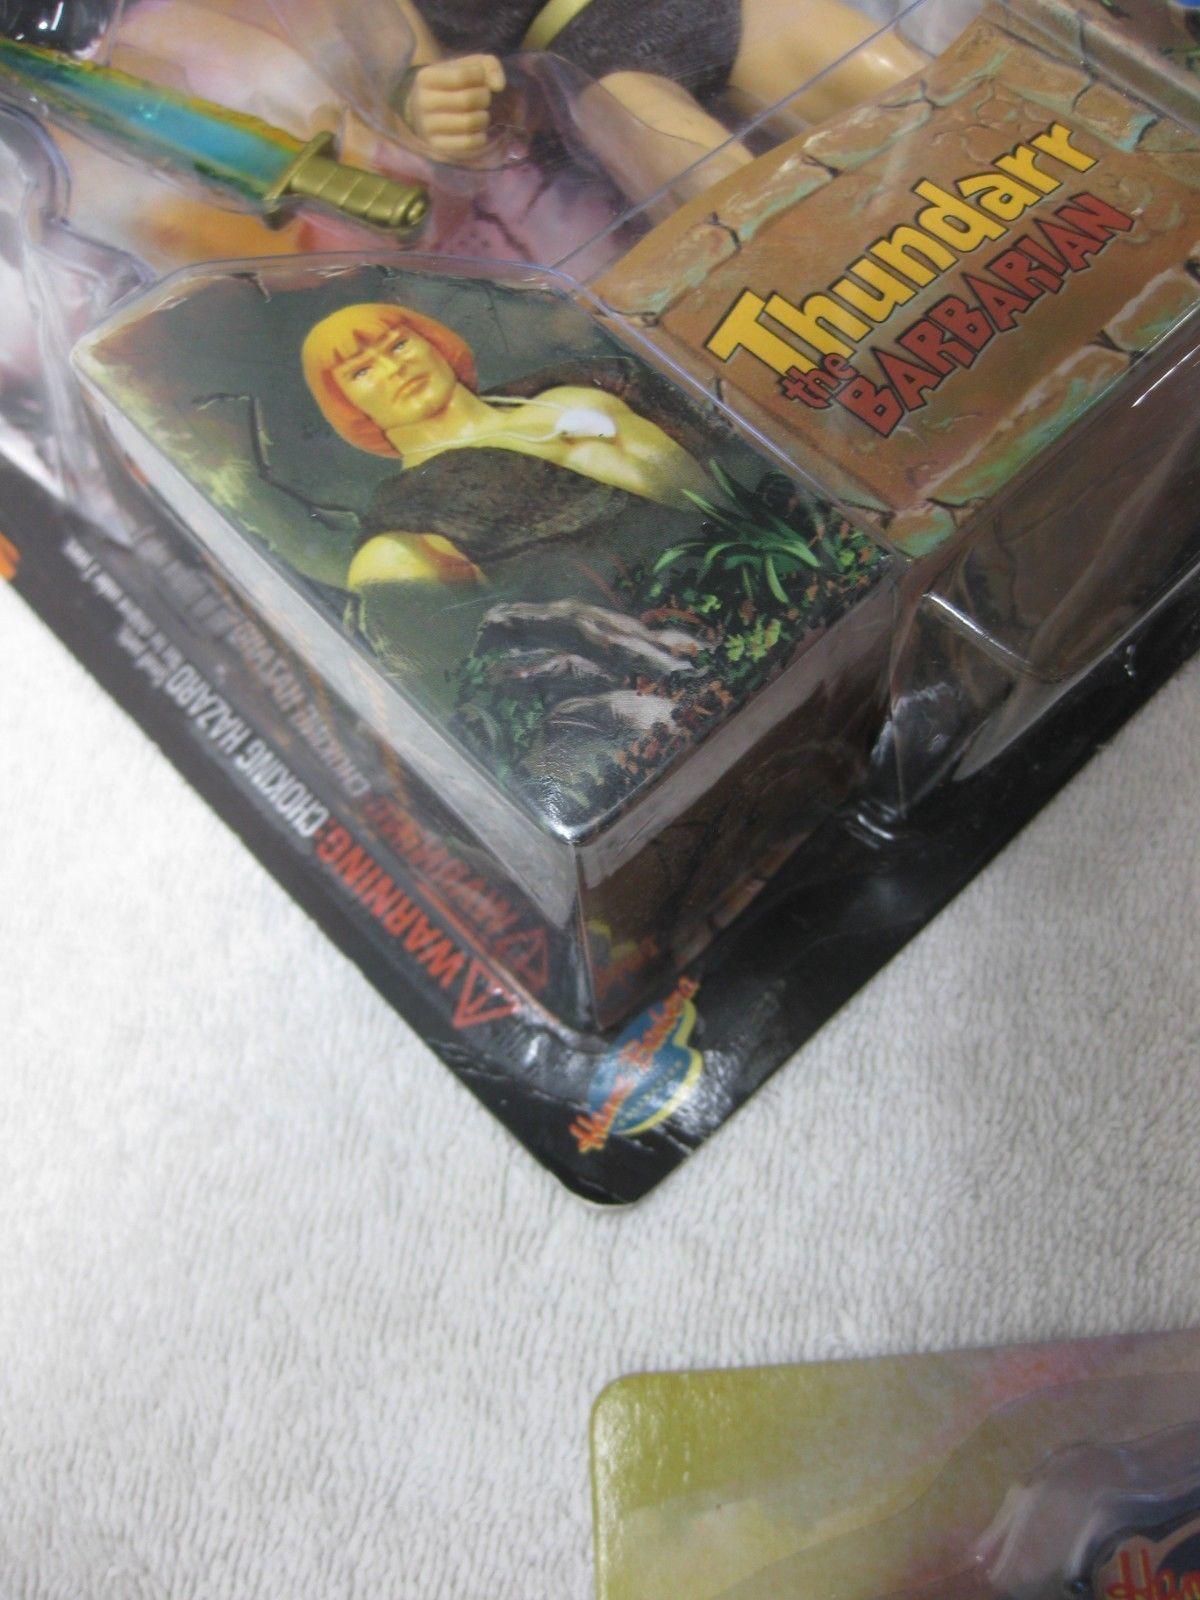 Thundarr The Barbarian, Ookla, Ariel Complete Set Figure - Toynami 2003 FS